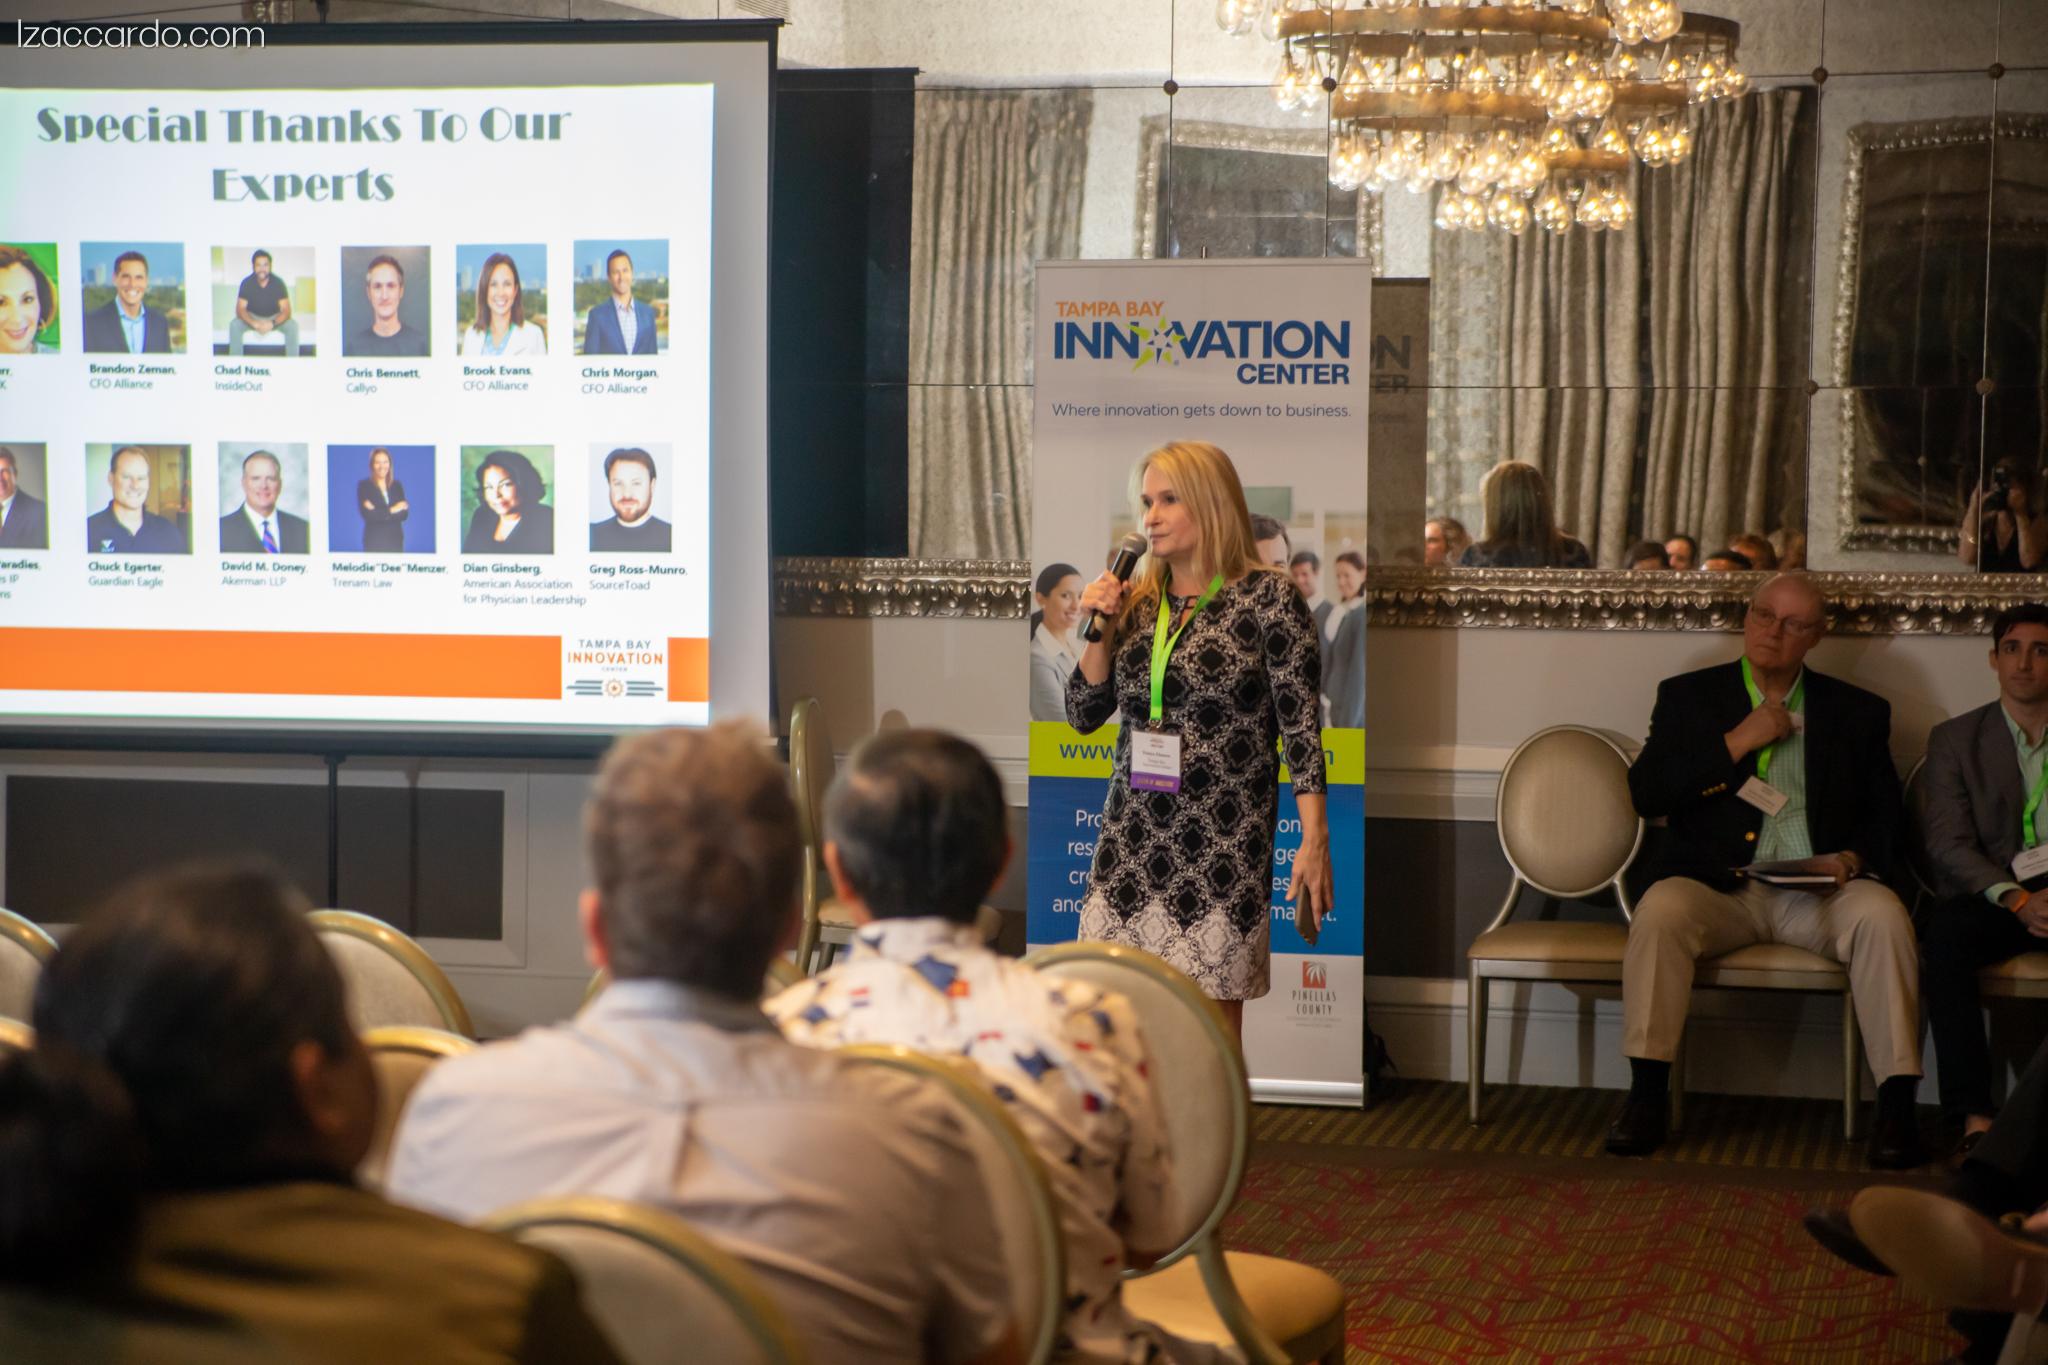 Presentation at the Tampa Bay Innovation Center